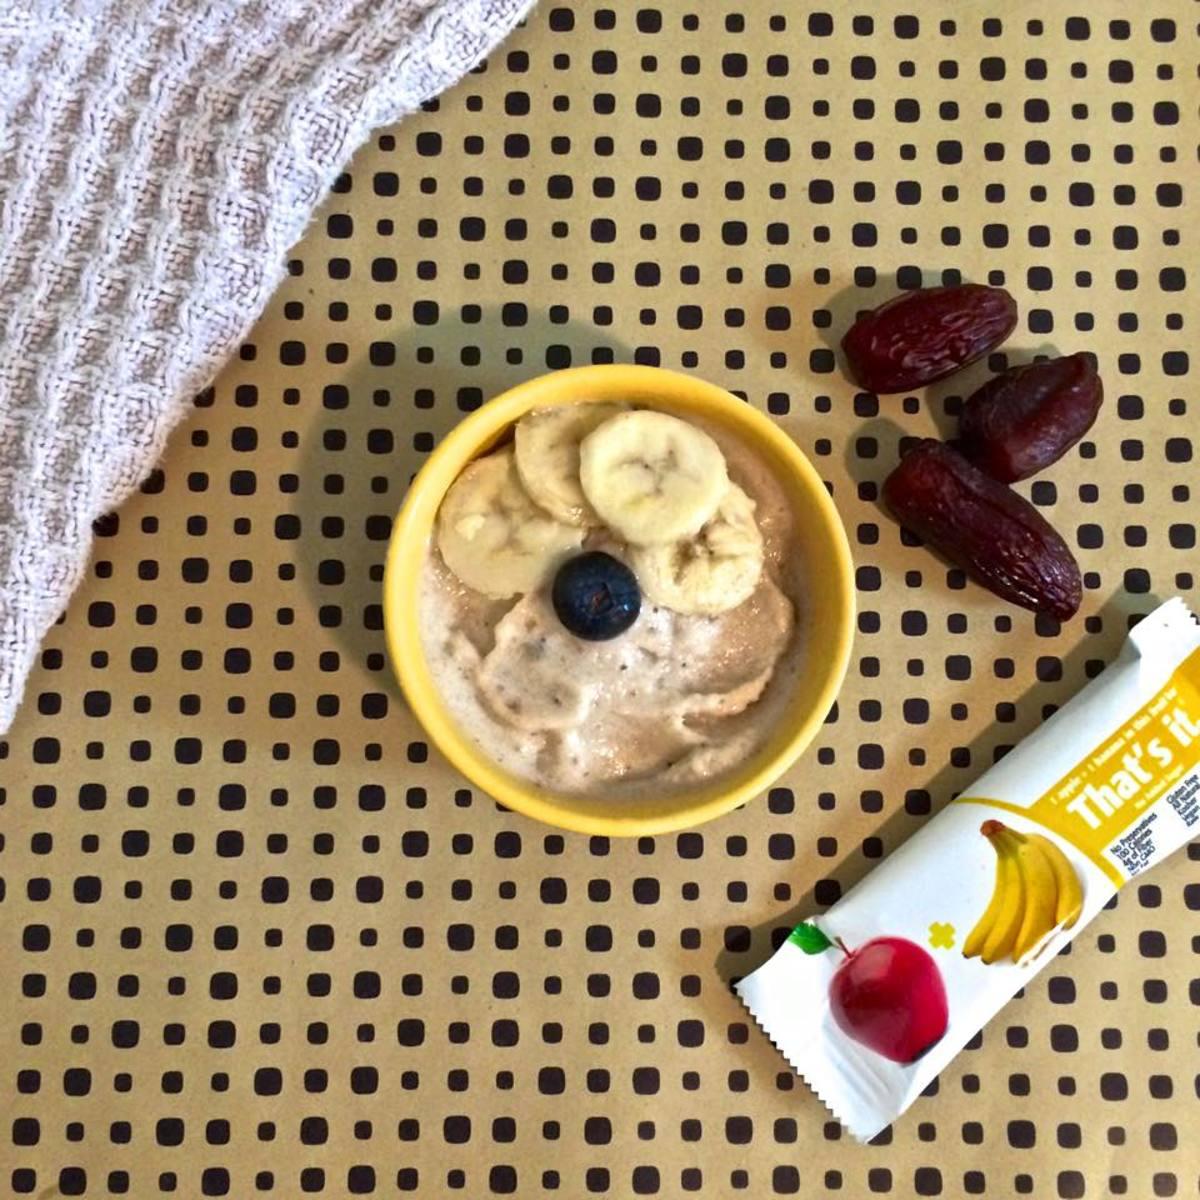 Healthy snacks, fruit bar